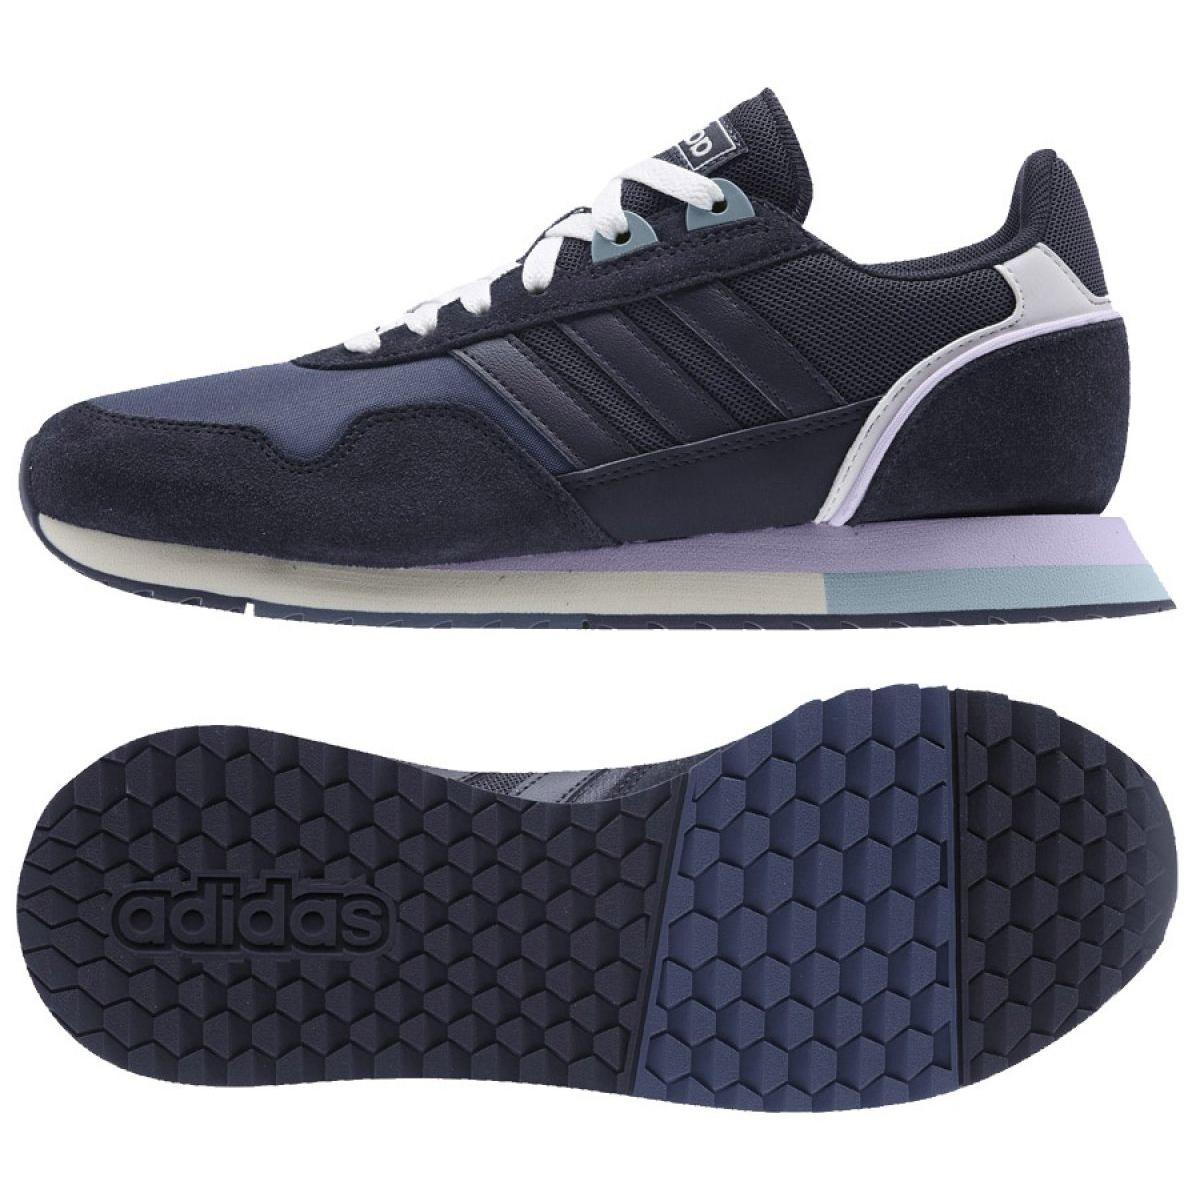 Reebok Unisex Kids Astroride Bd5013 Low-Top Sneakers